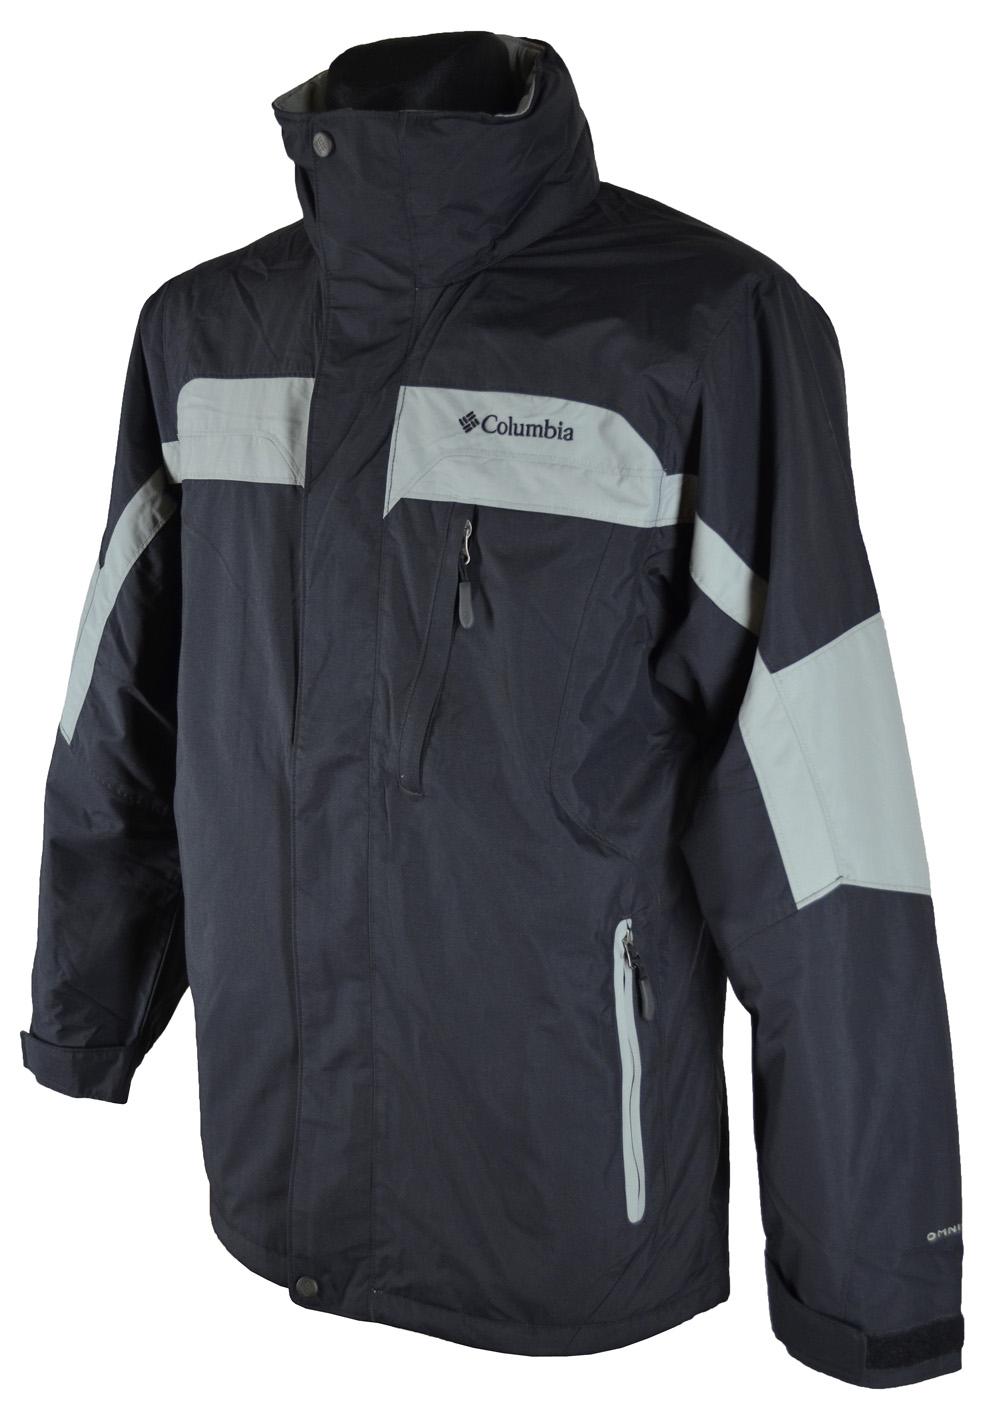 474ce57d Columbia Киев - мужские куртки, пуховики Columbia Omni Heat купить в ...